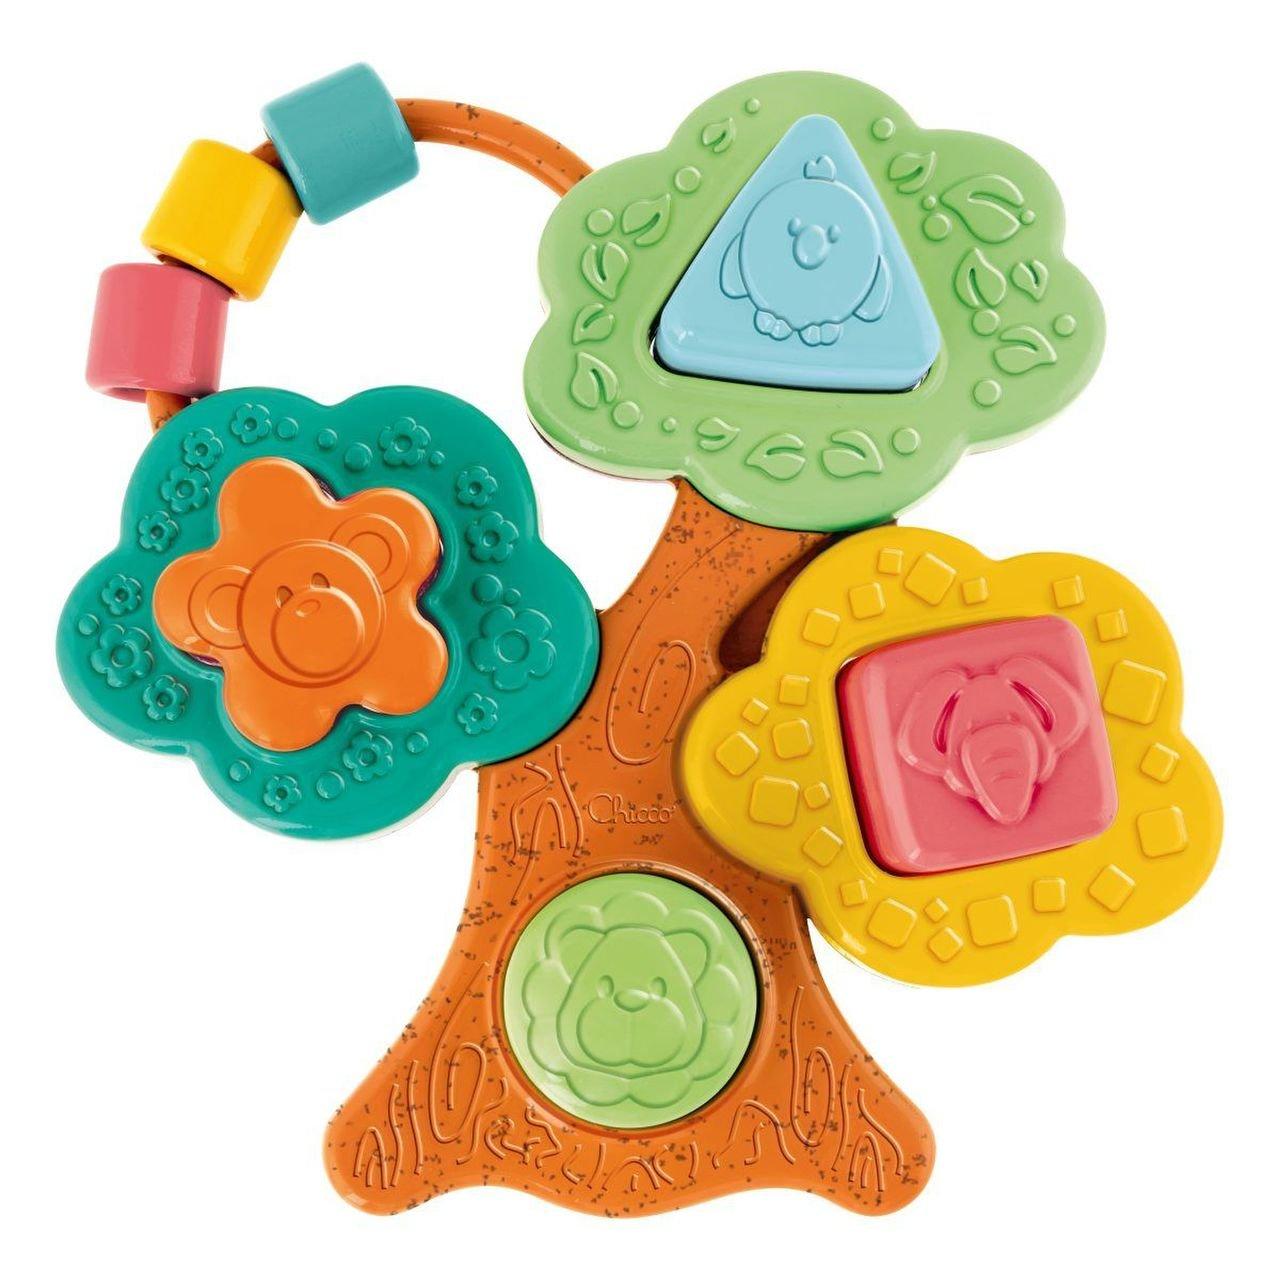 Edukaèní hraèka Sorter Baobab